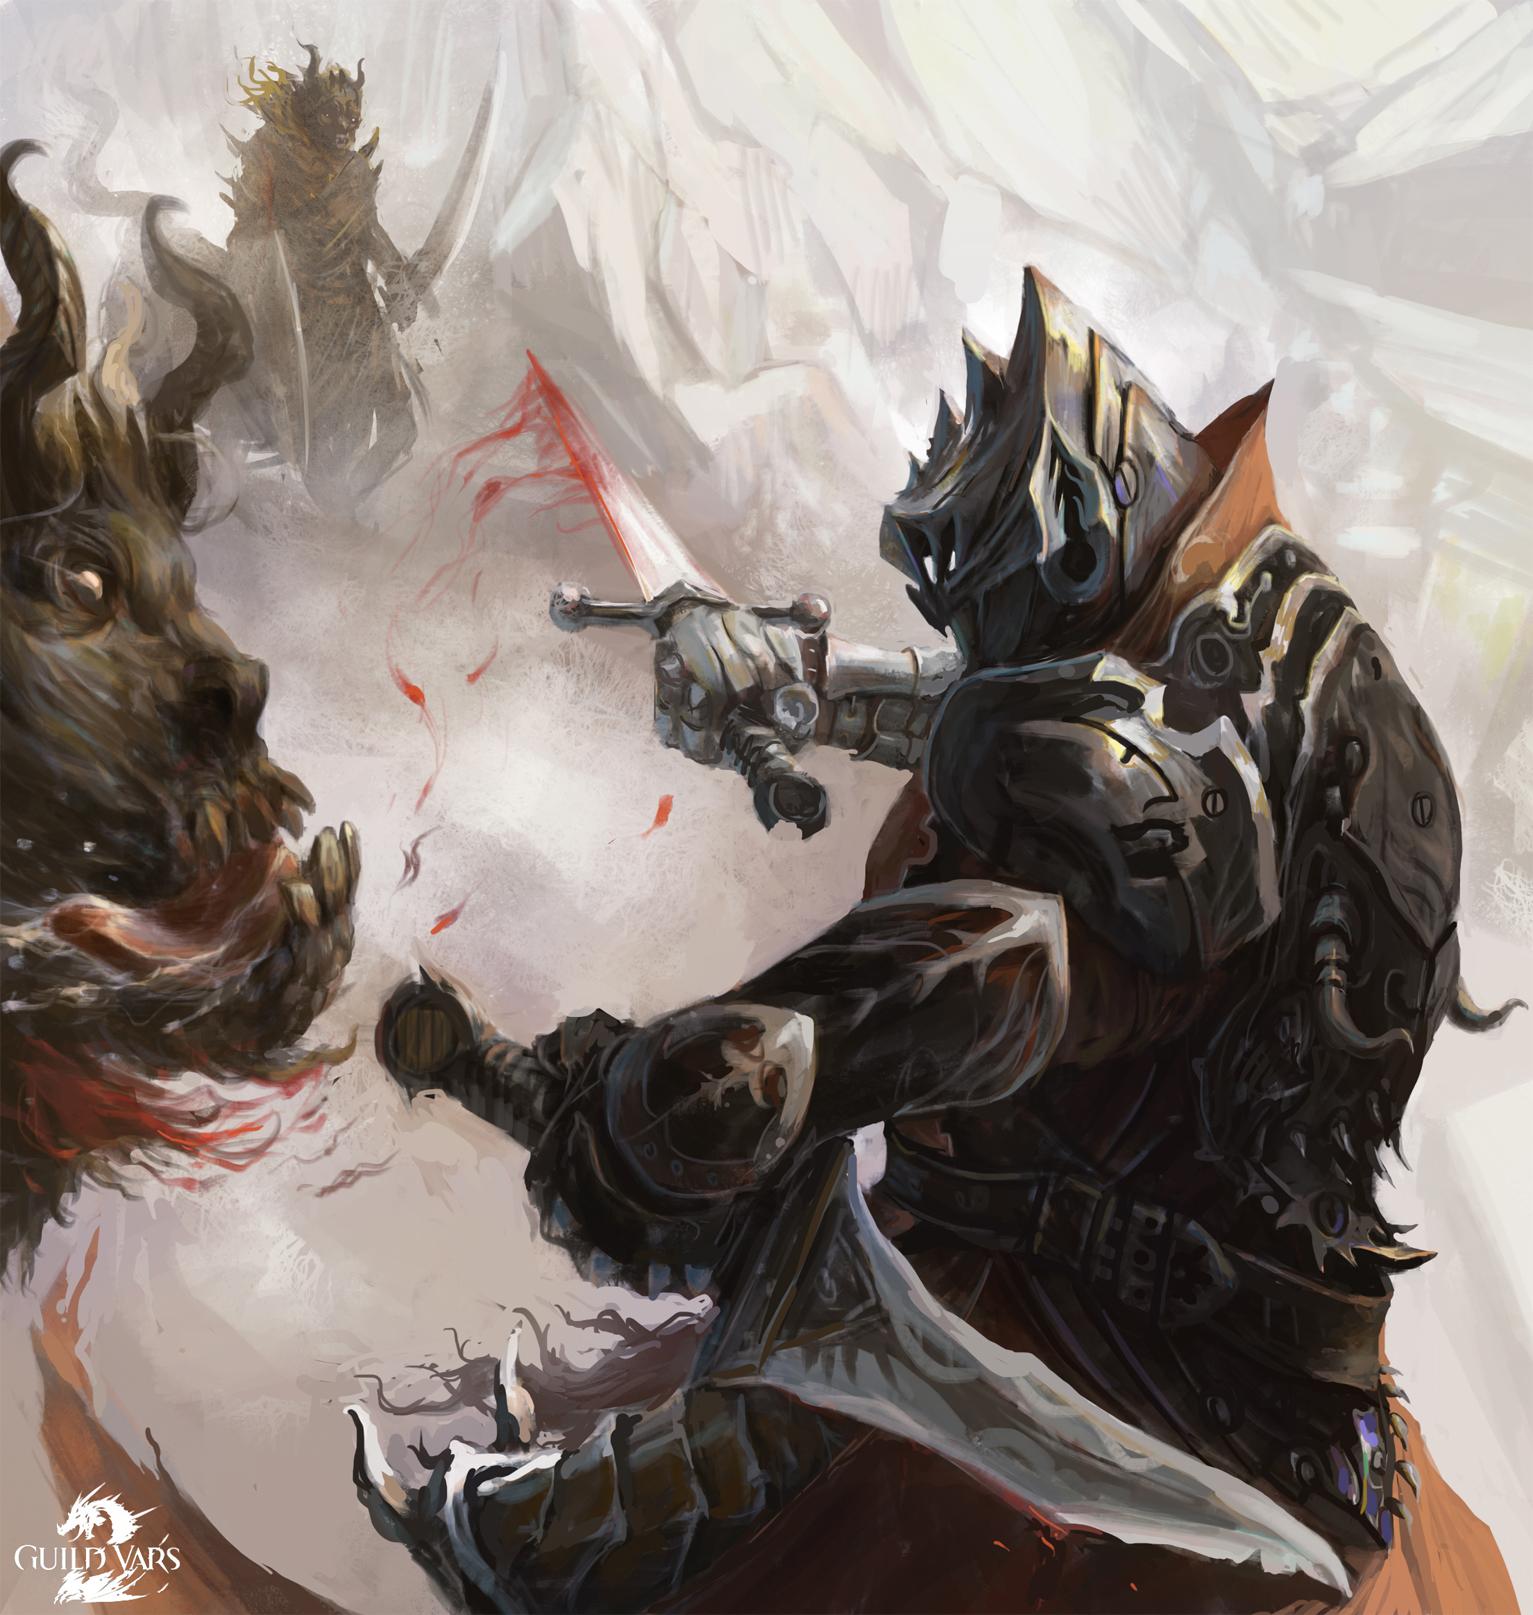 guildwars2 by laitianc